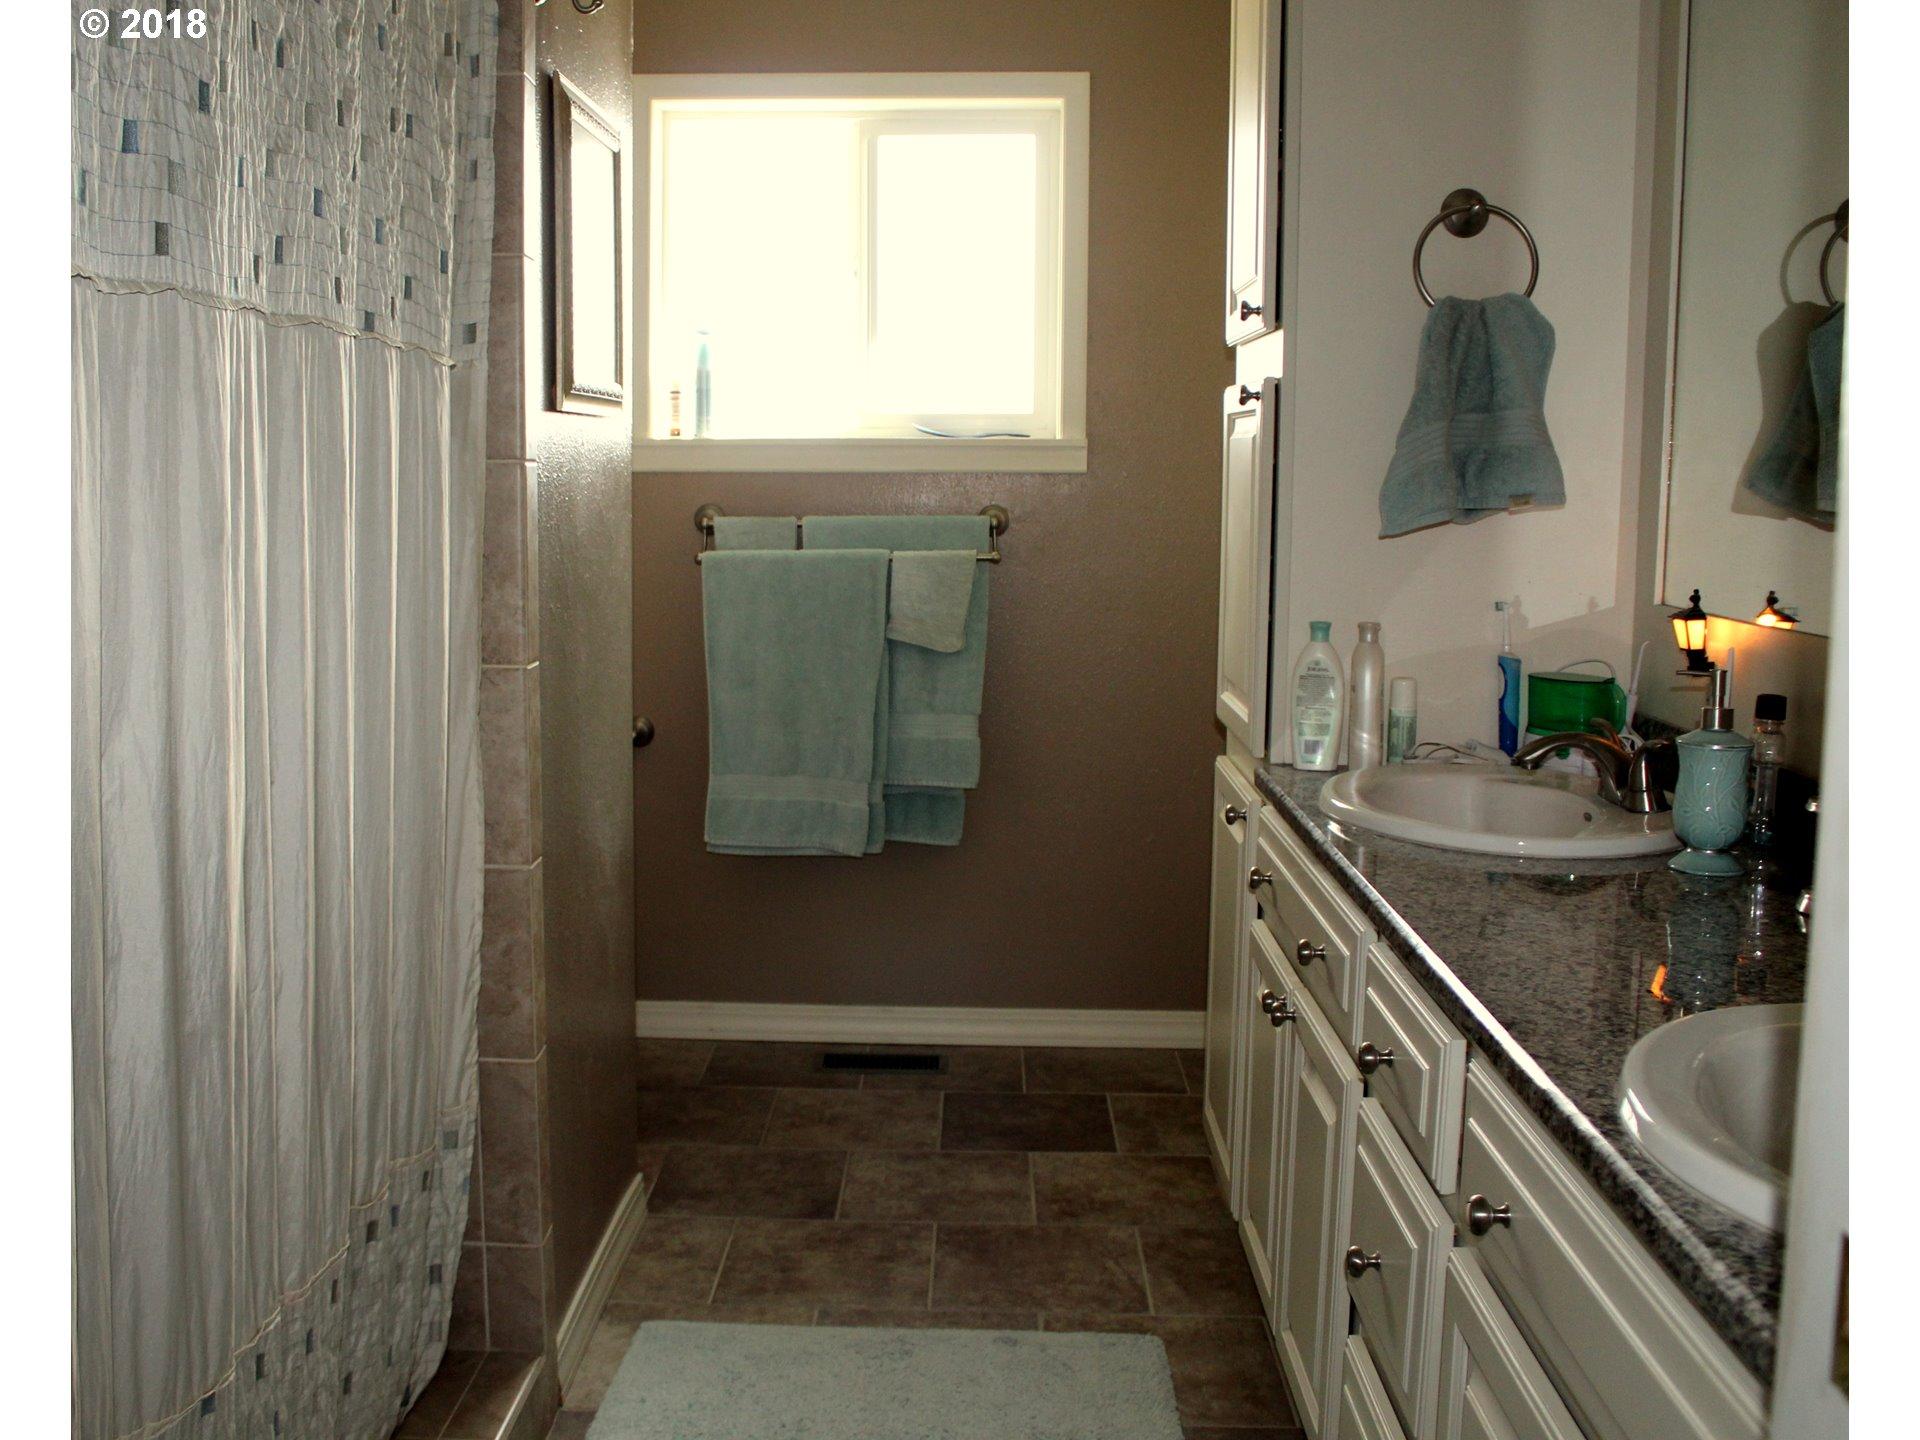 http://photos.rmlsweb.com/webphotos/18100000/80000/2000/18182361-3.jpg